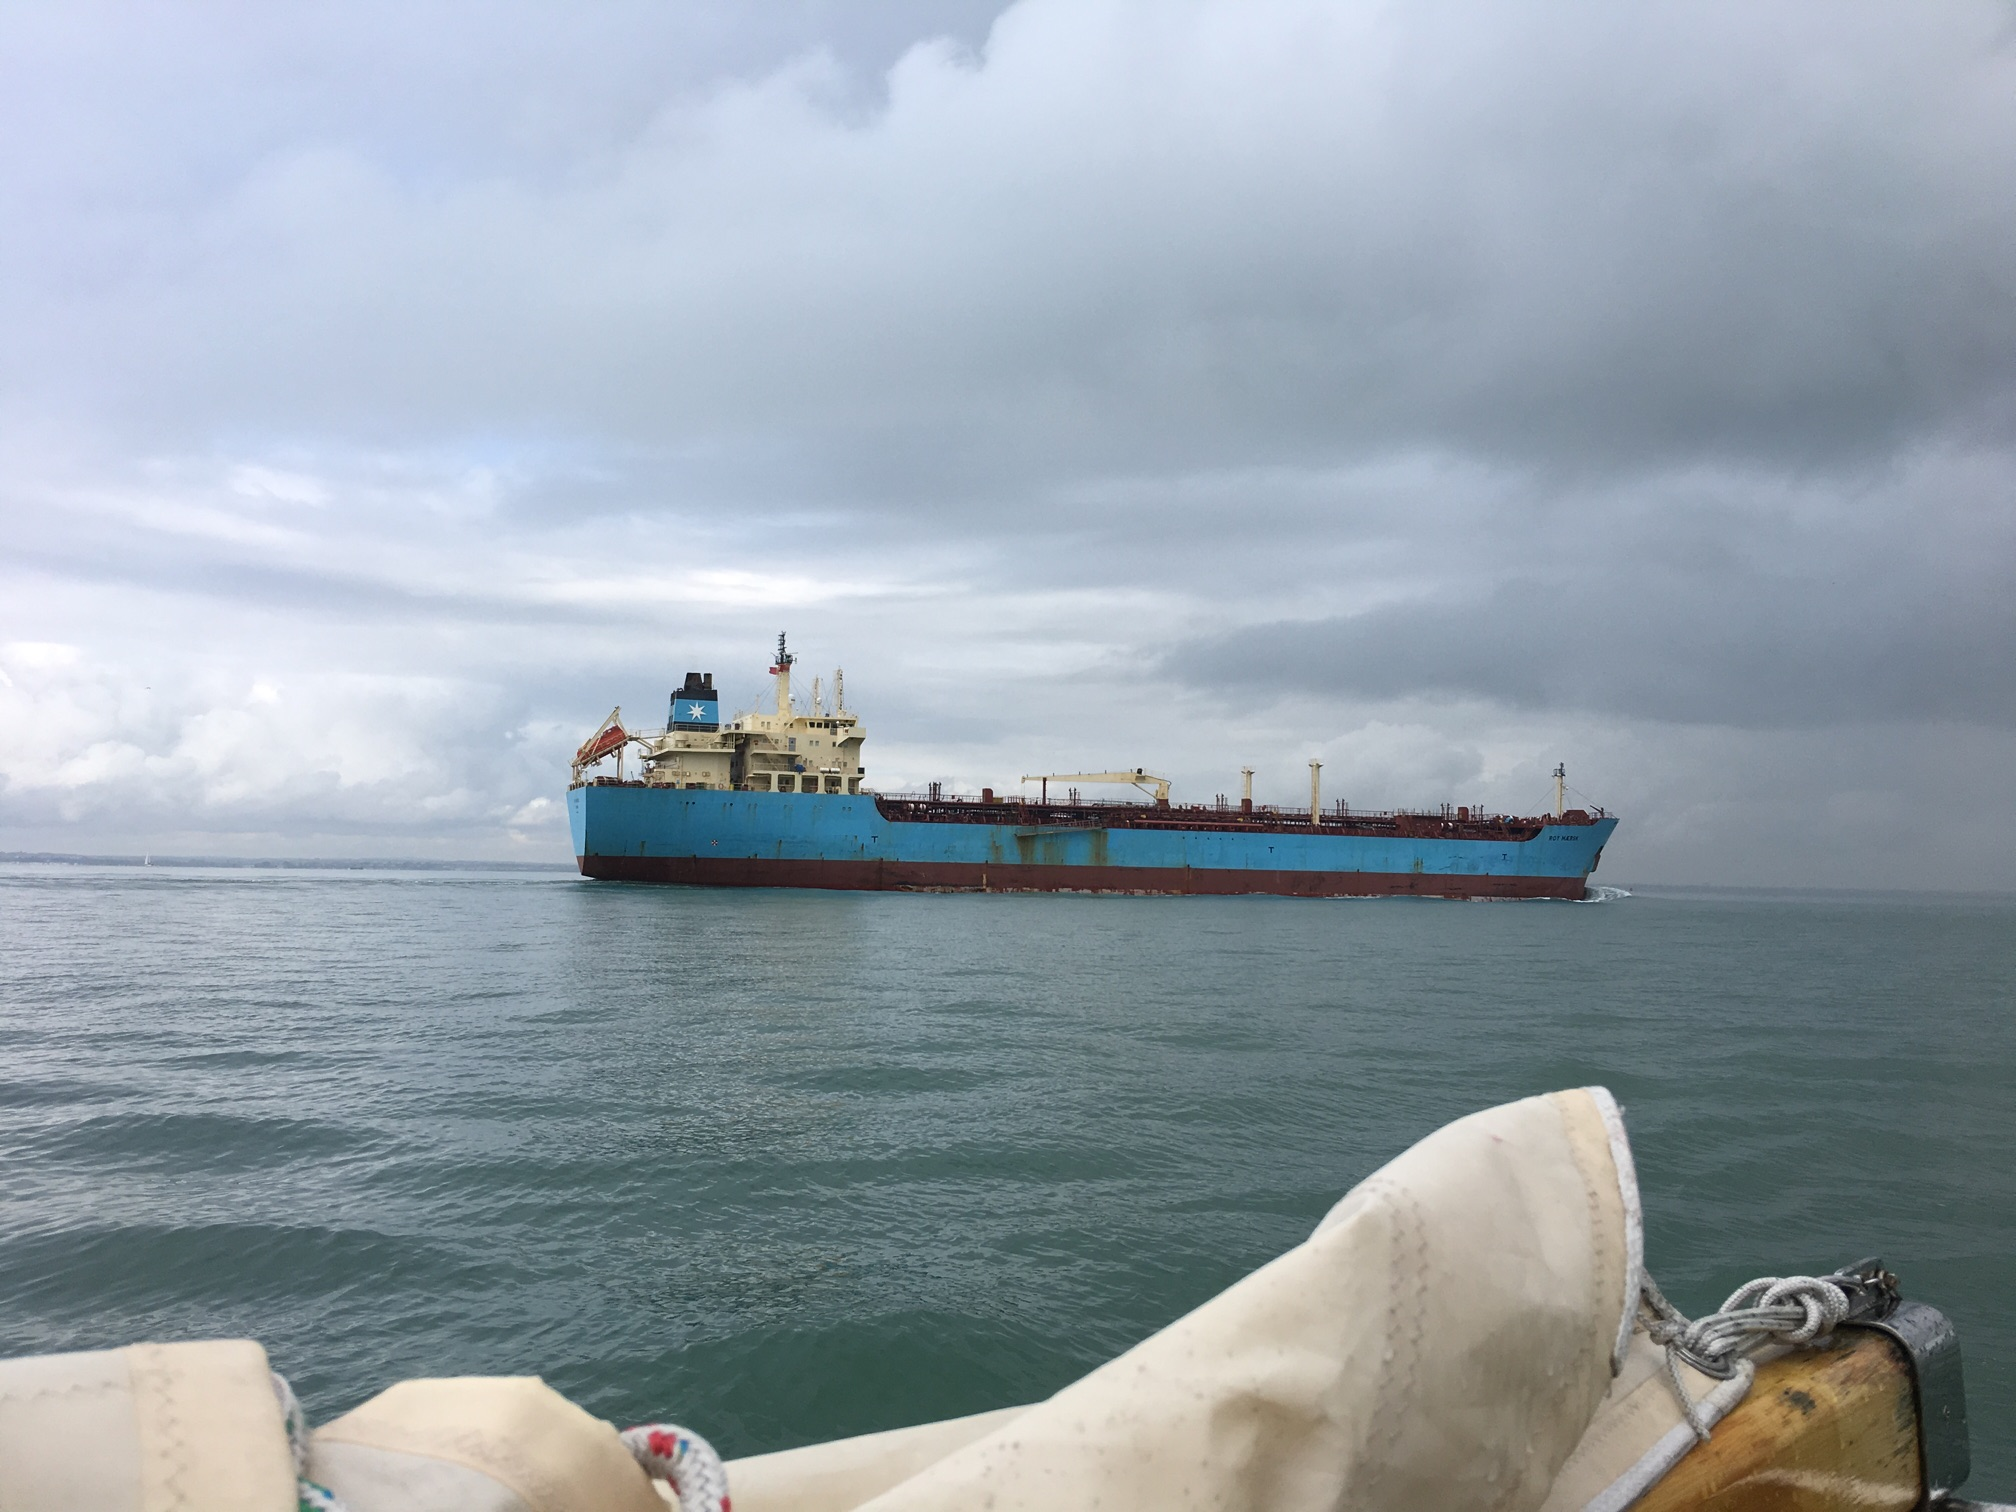 15 Oct 19 - Tanker